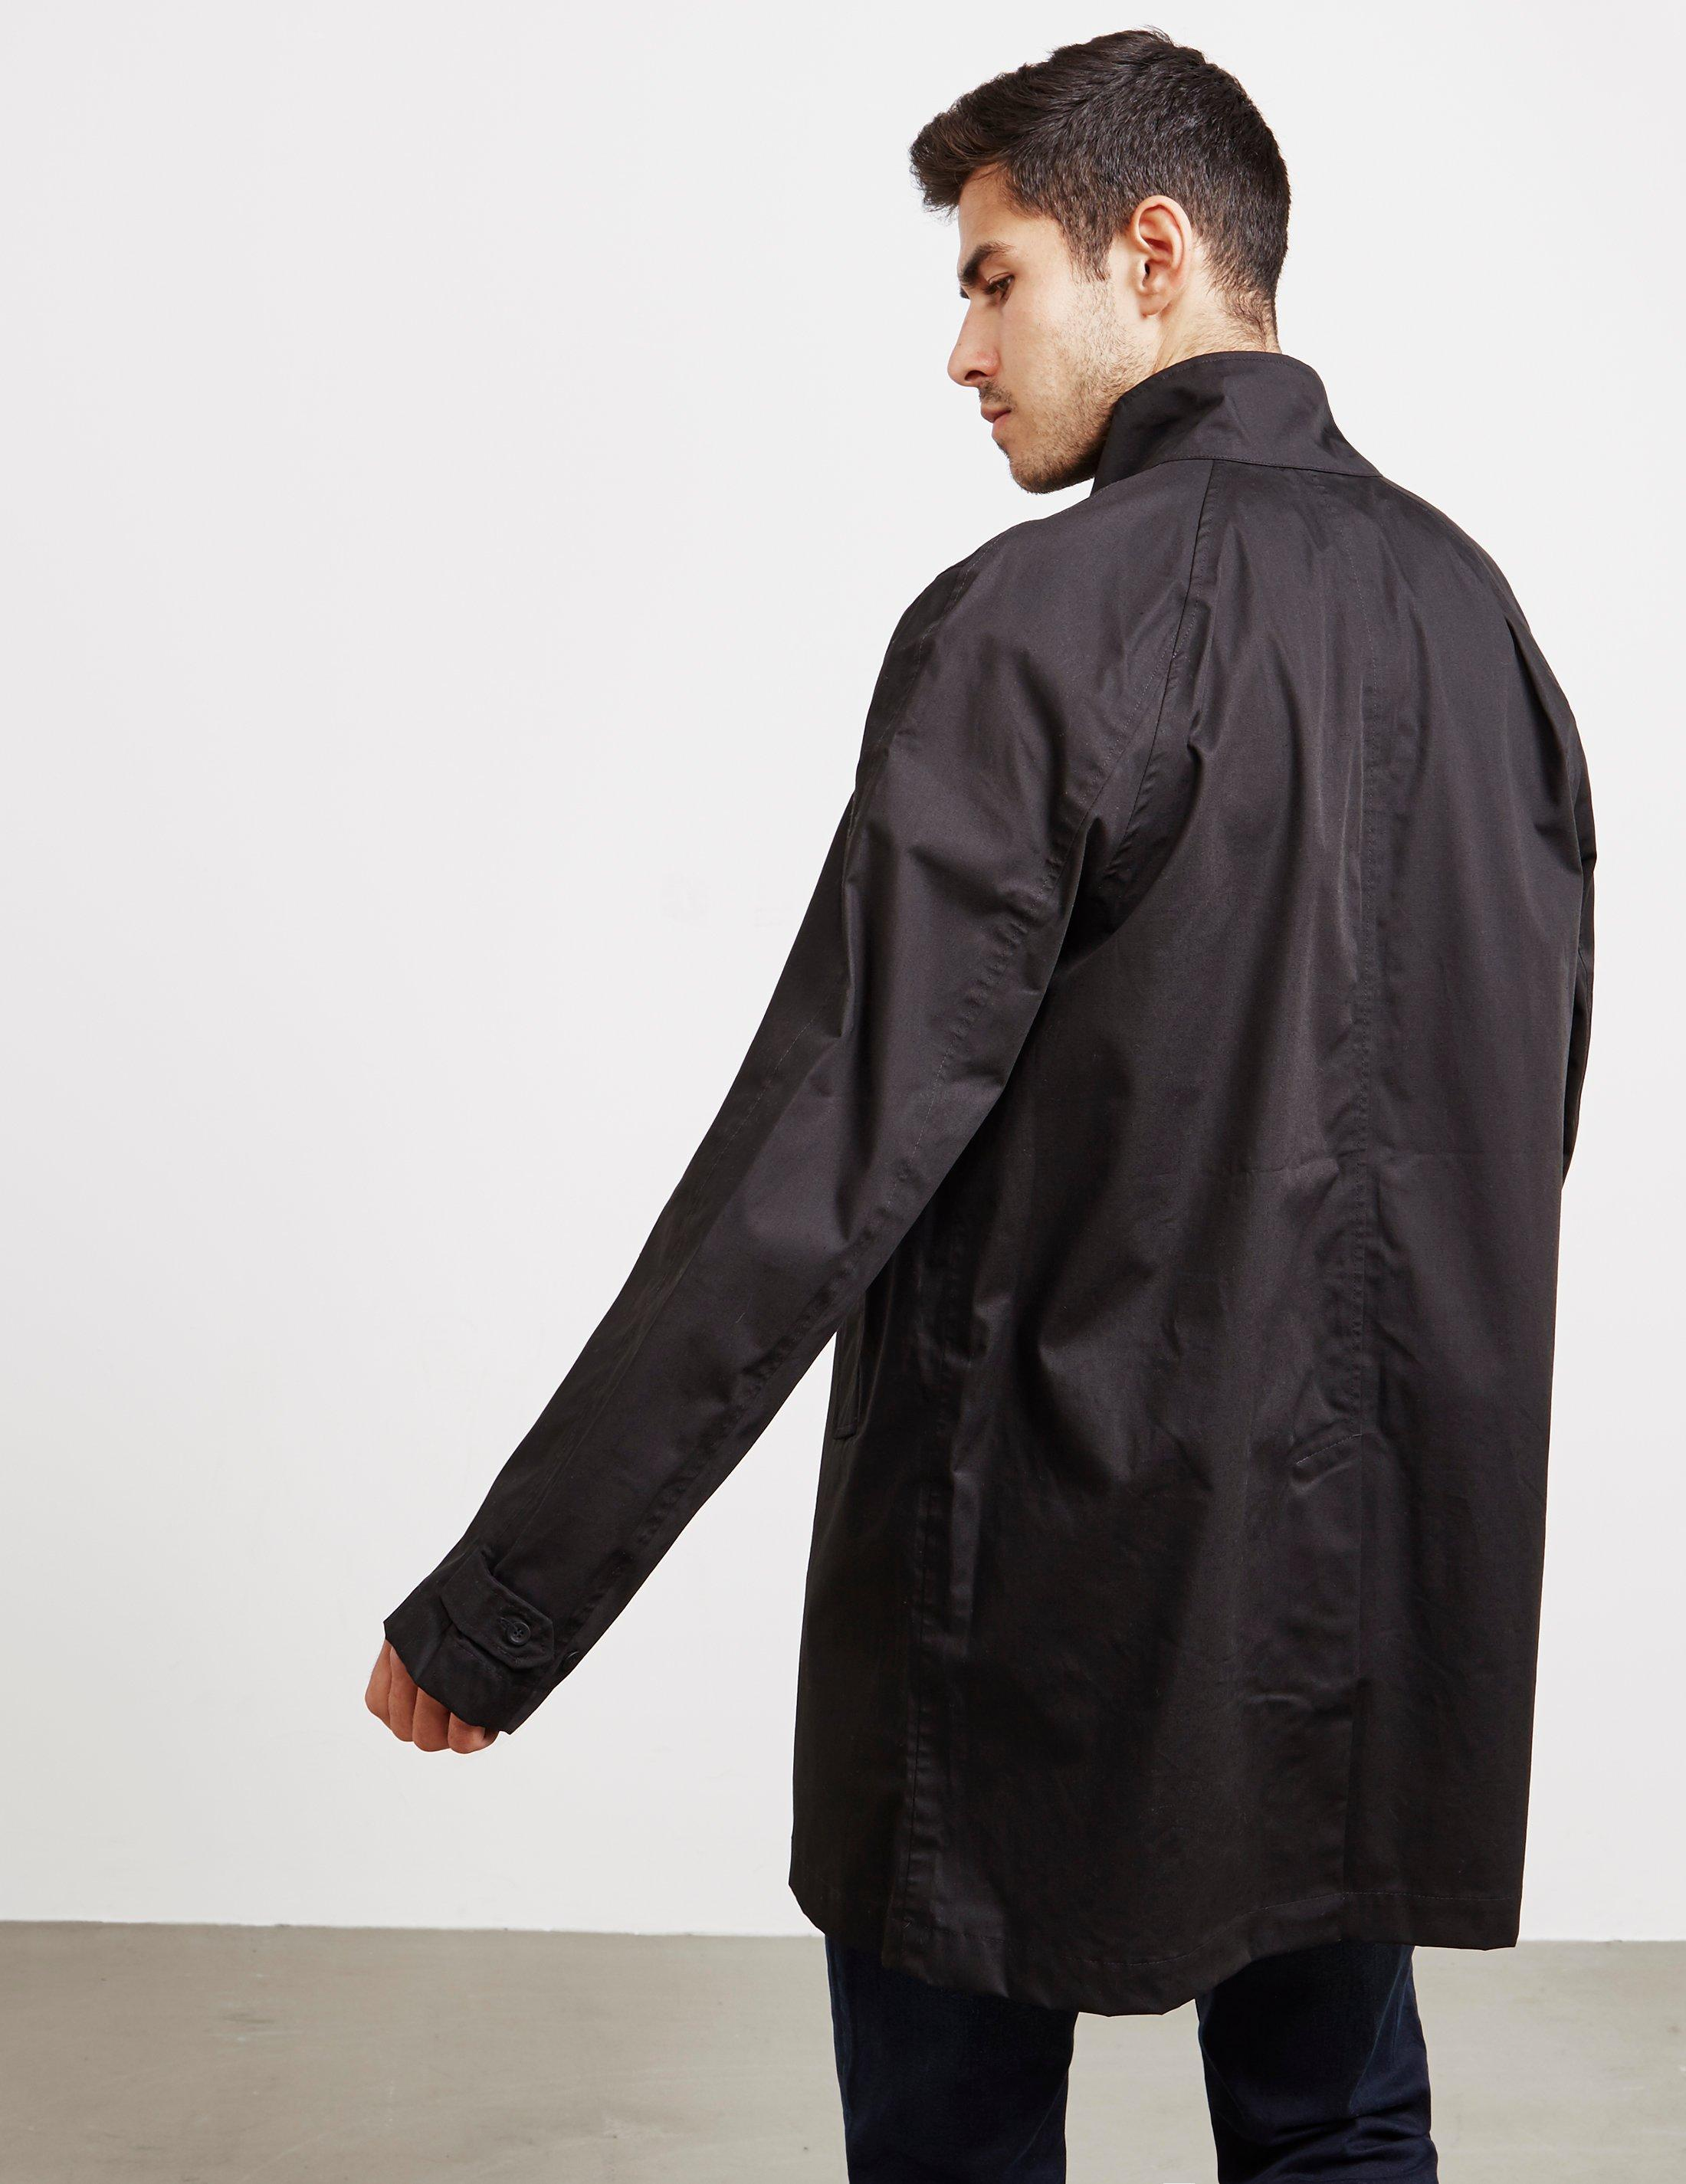 26dad42d4991 Fred Perry - Harrington Mac Jacket Black for Men - Lyst. View fullscreen